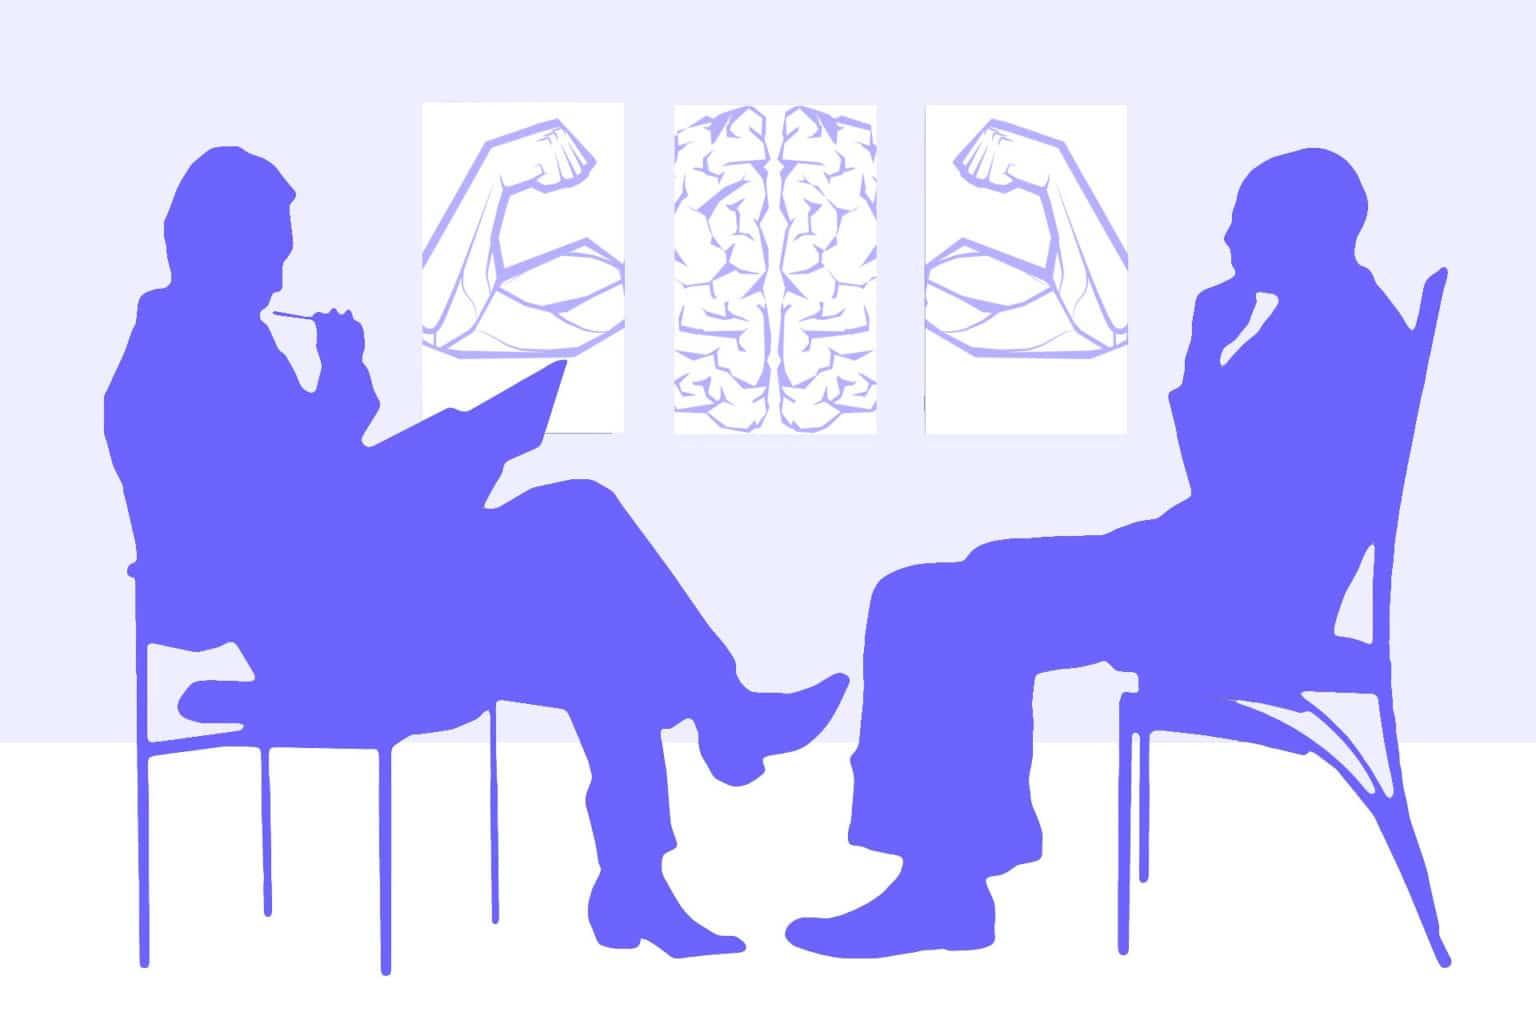 Use Psychology as a motivational tool